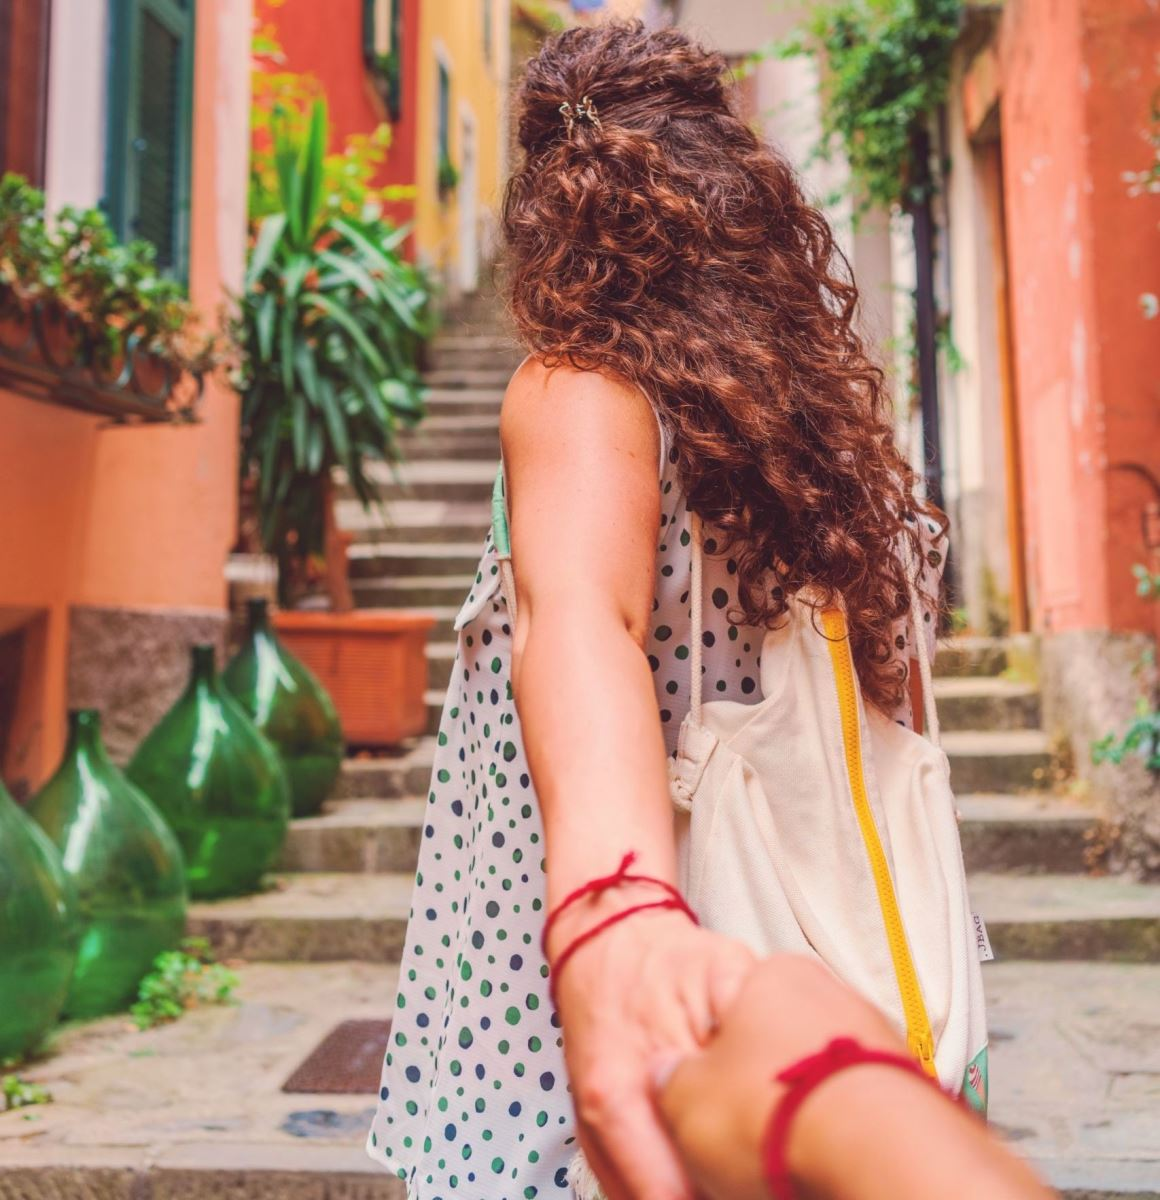 Frau nimmt Betrachter an die Hand genauso wie Gehirngerechtes Lernen zum Sprachenlernen motiviert